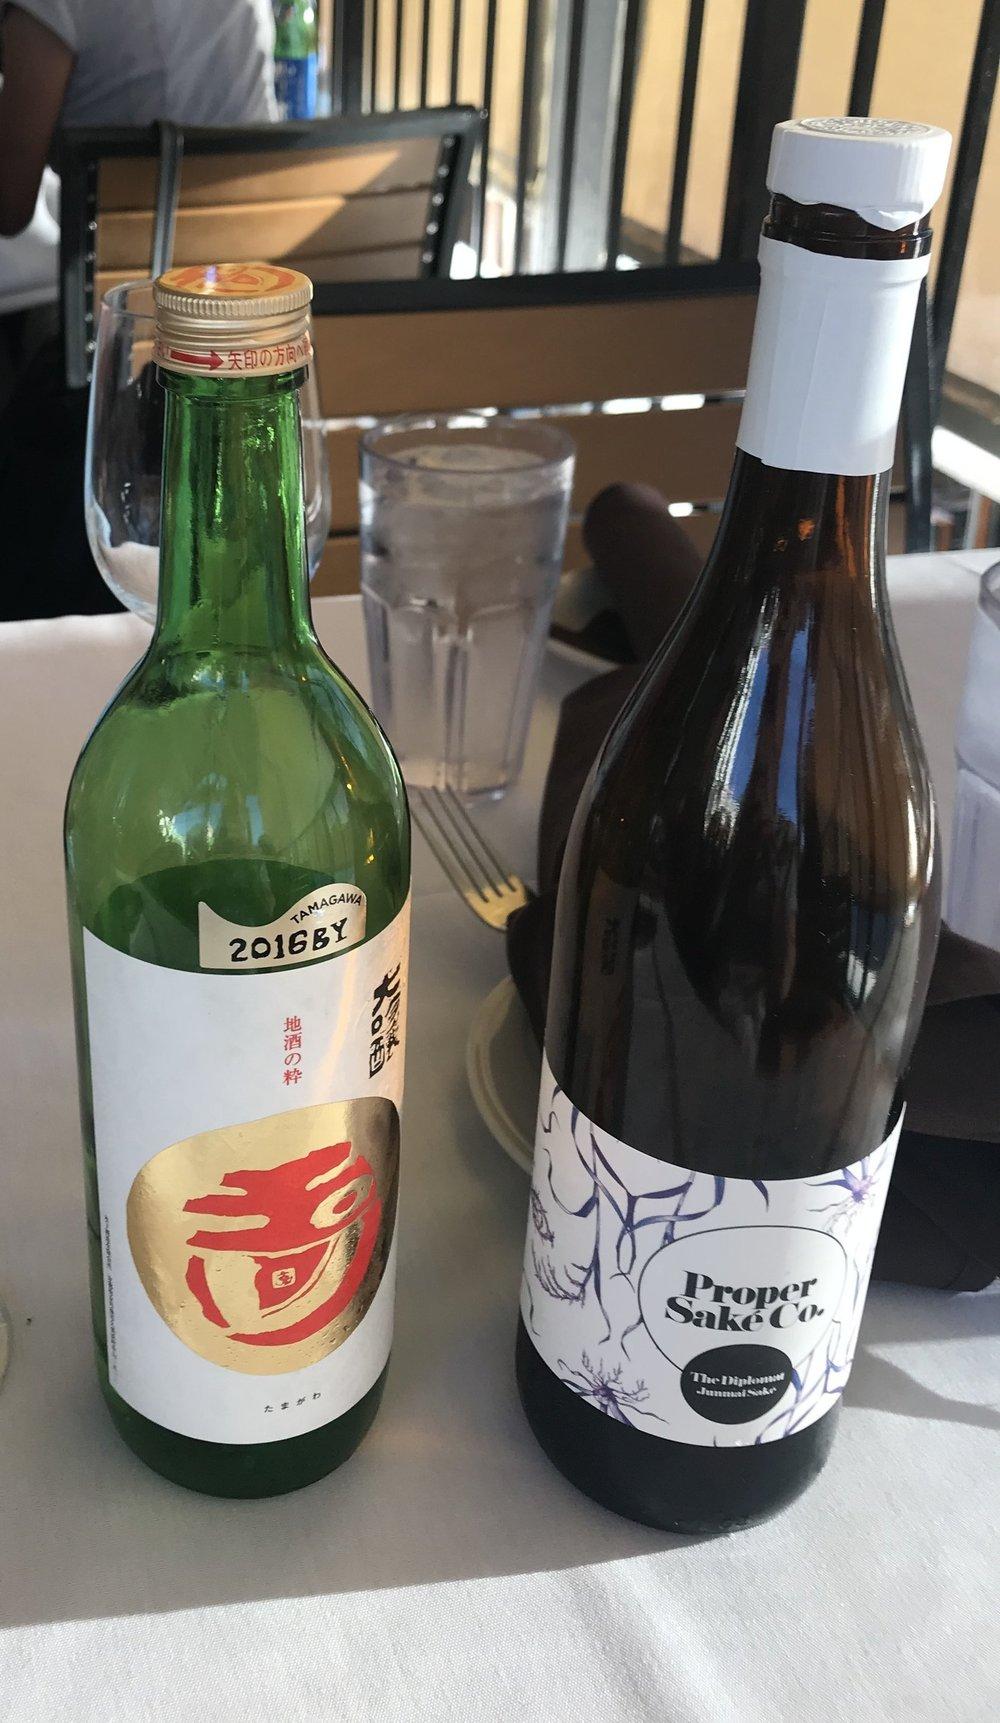 The author's sake from Nashville's Proper Sake Co., next to Philip Harper's sake.